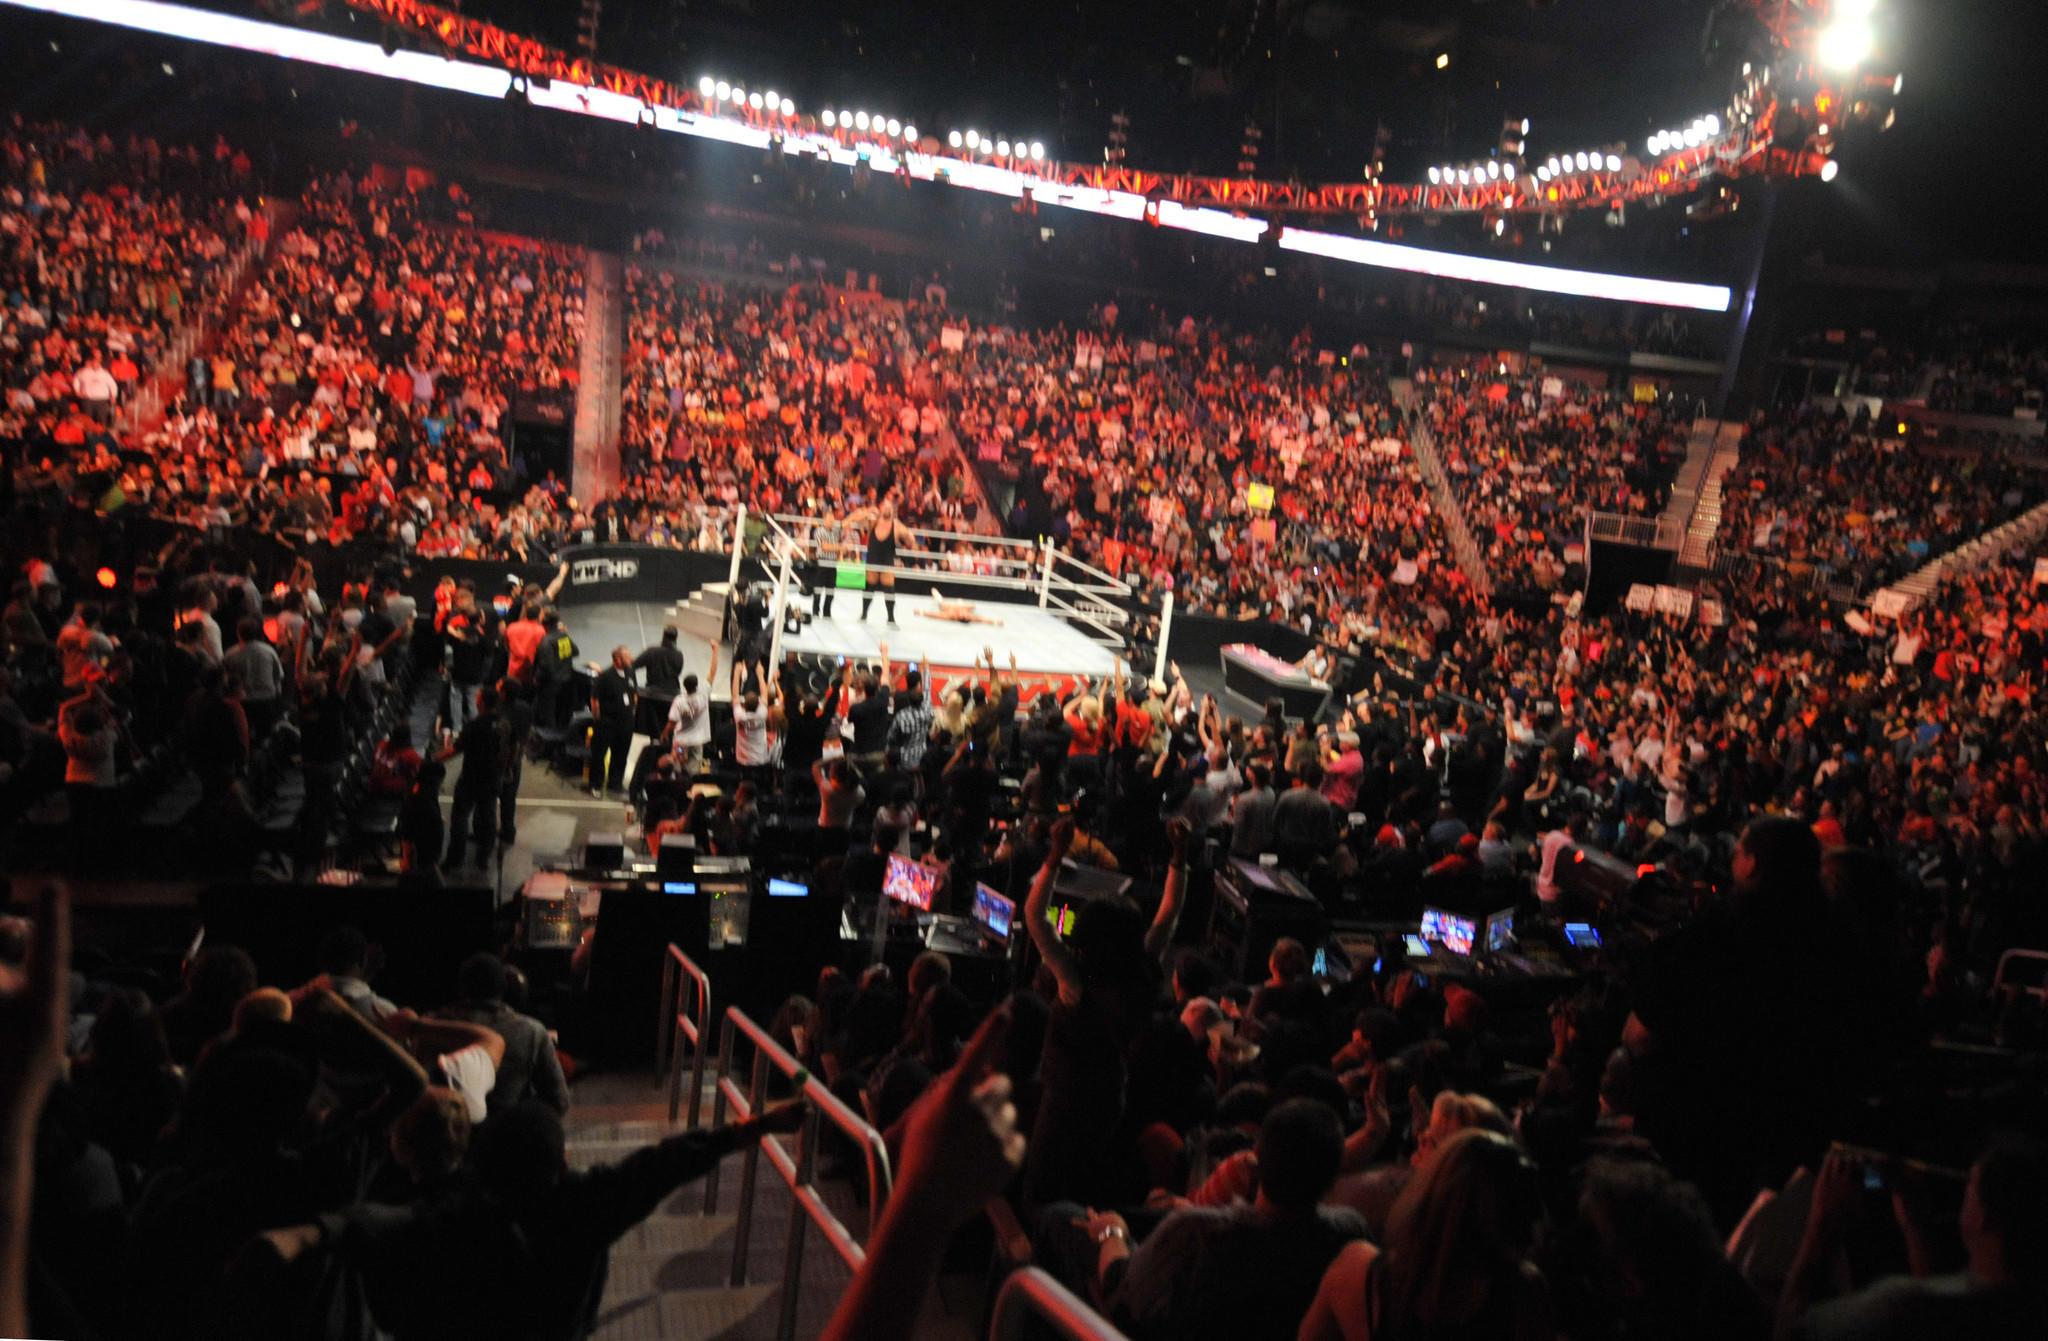 General view of the WWE Monday Night Raw Supershow in Atlanta, Georgia.